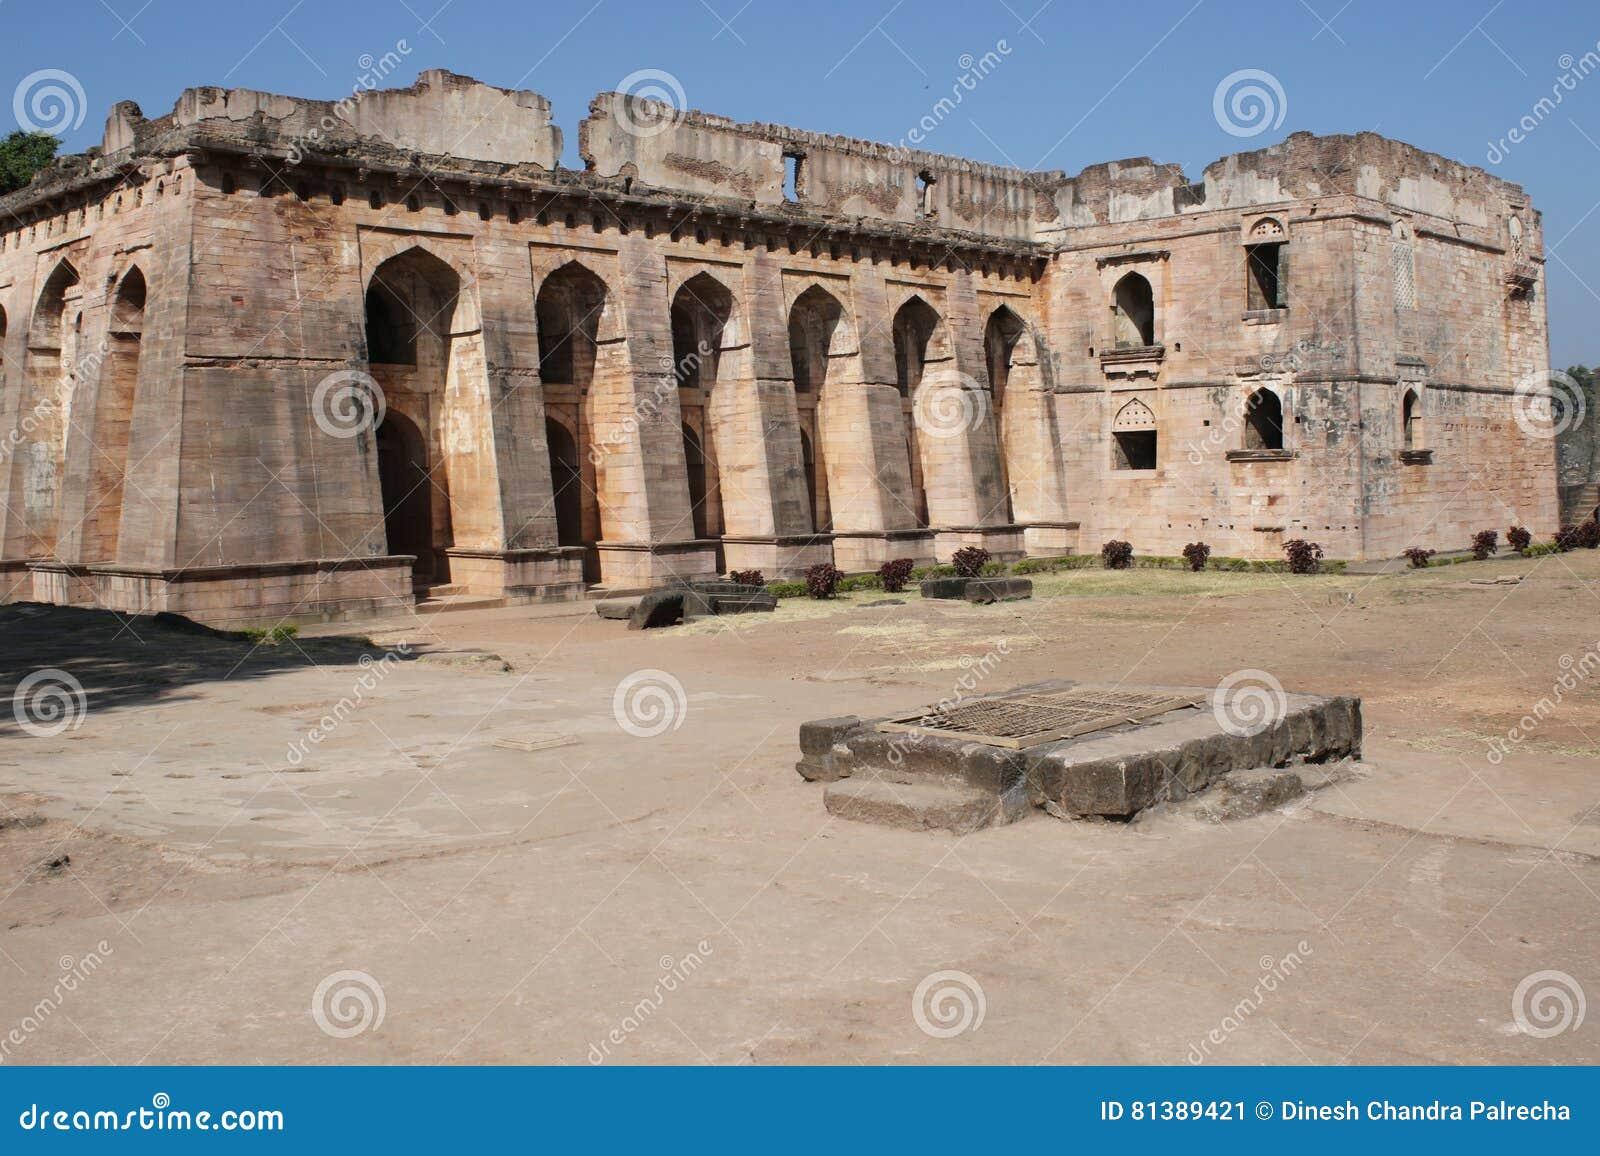 Historische Architektur, hindola mahal